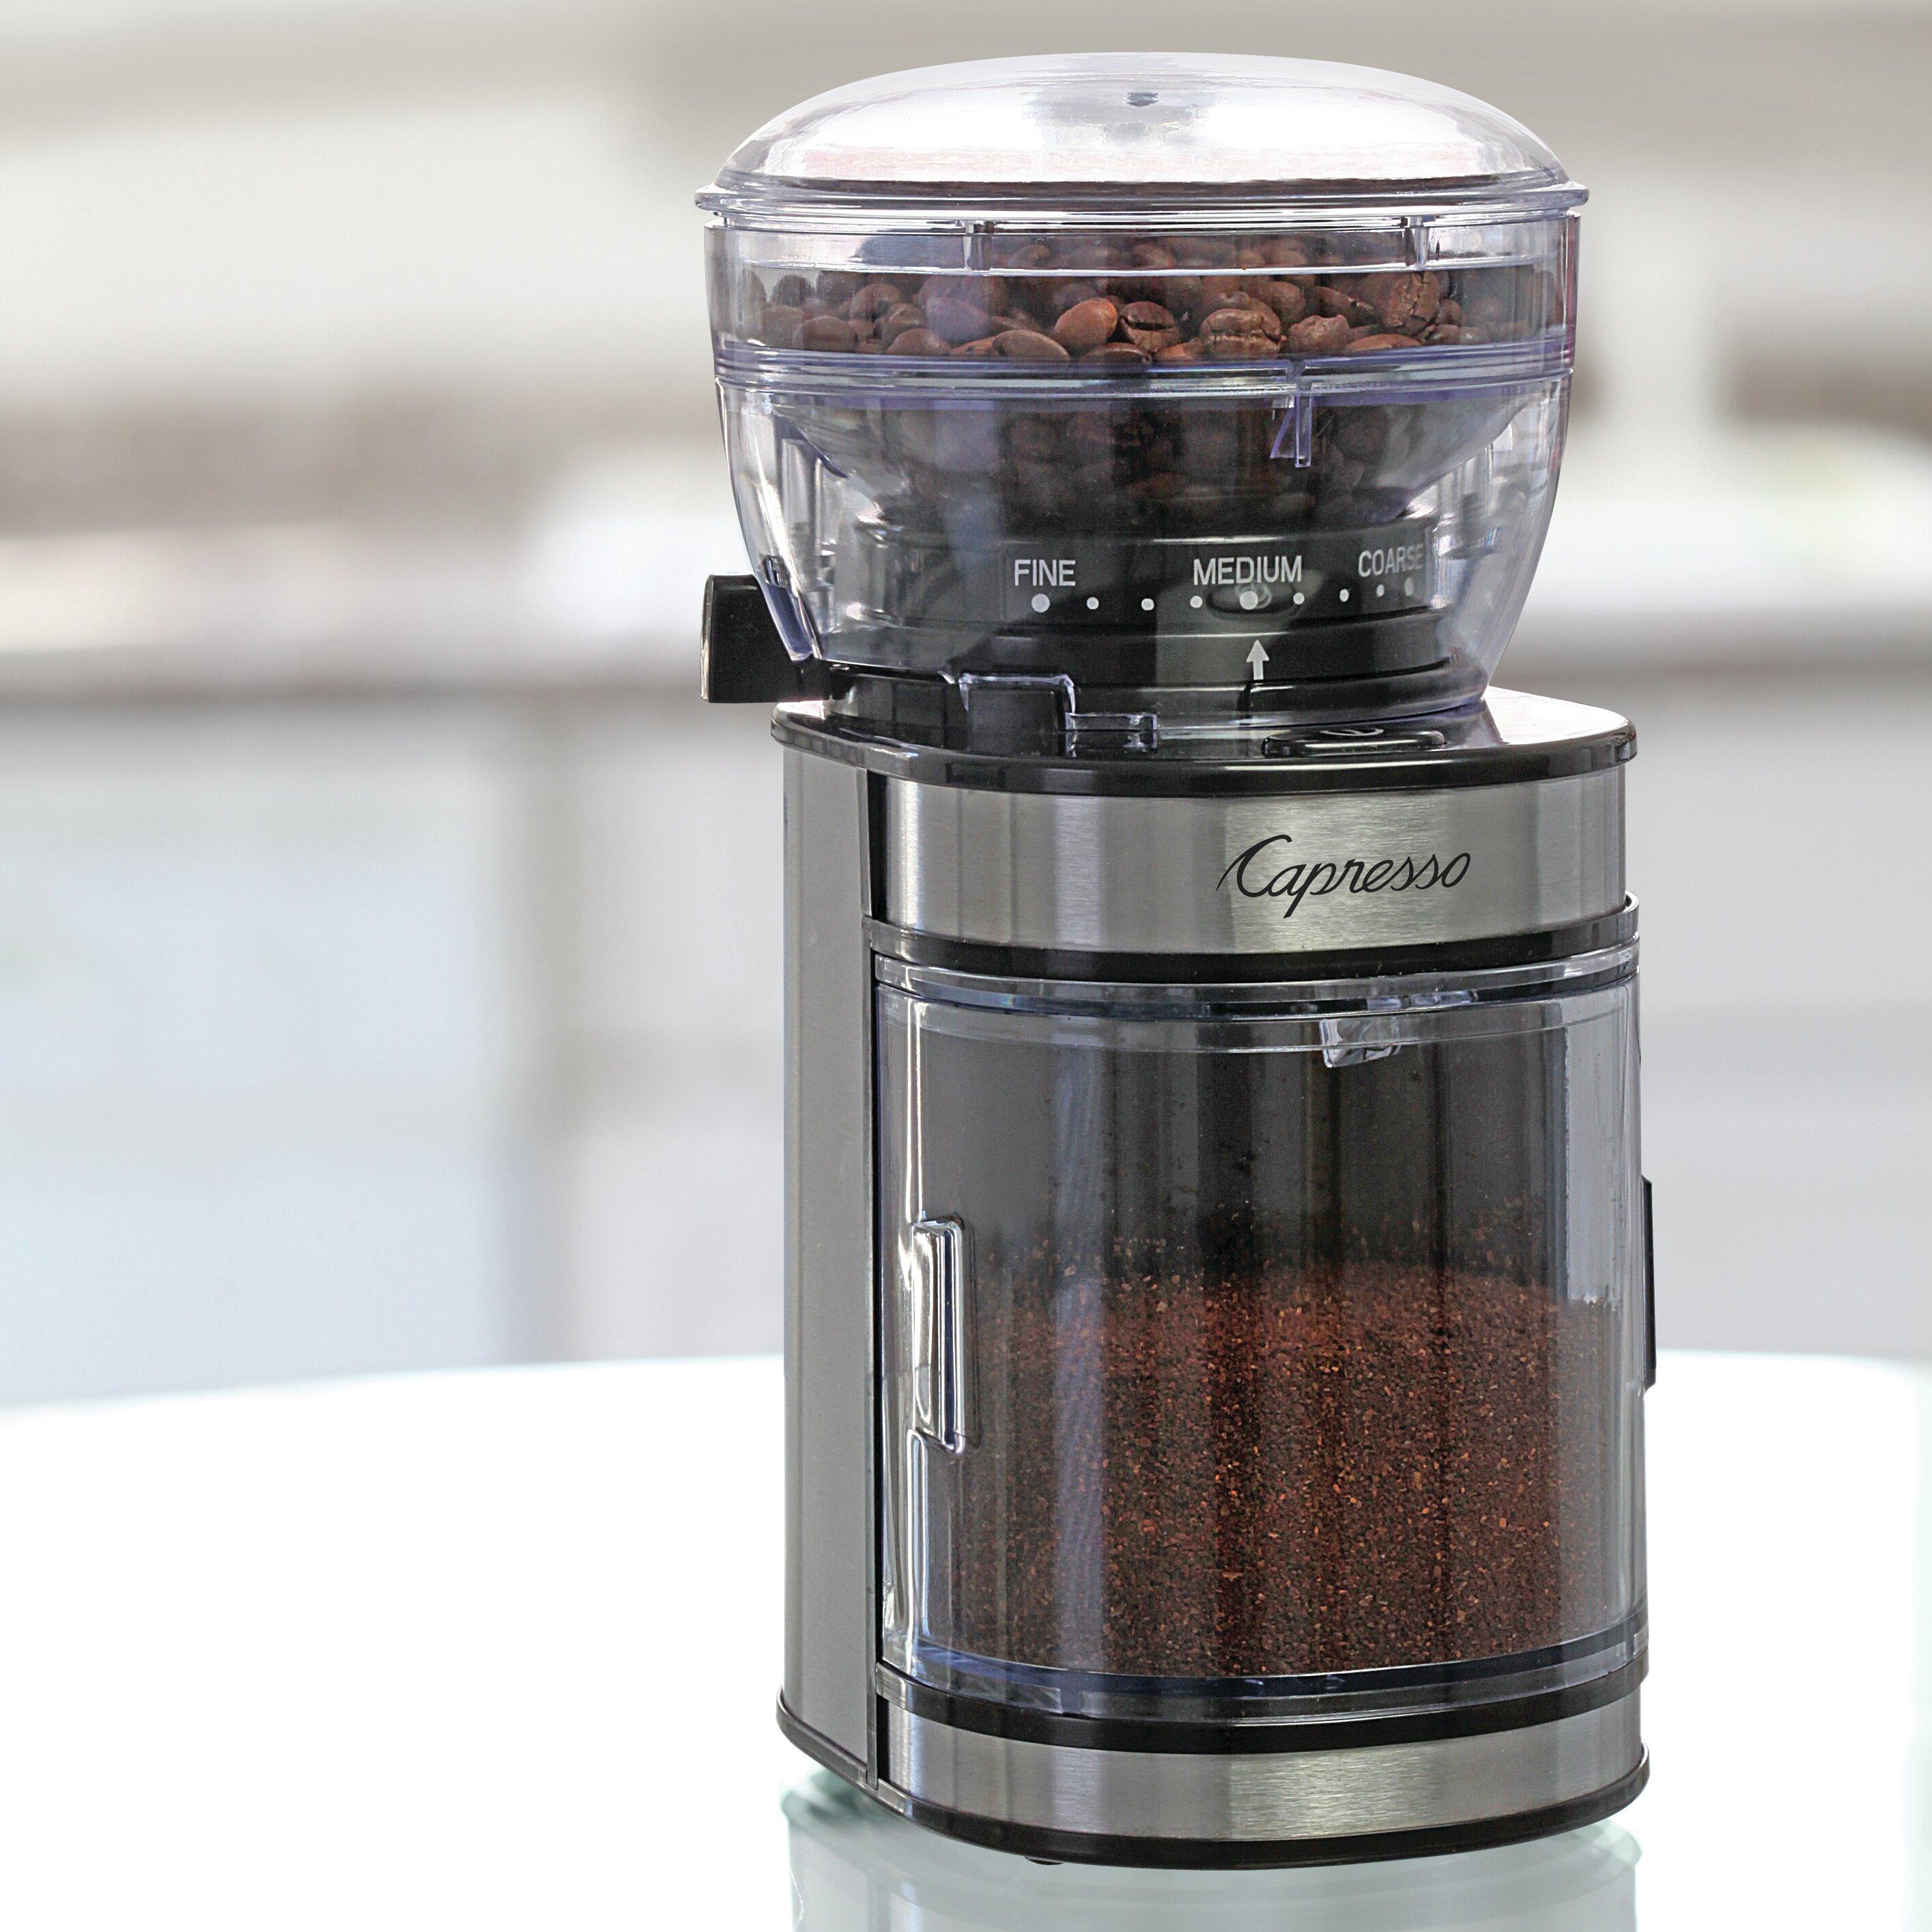 capresso ceramic electric burr coffee grinder reviews. Black Bedroom Furniture Sets. Home Design Ideas